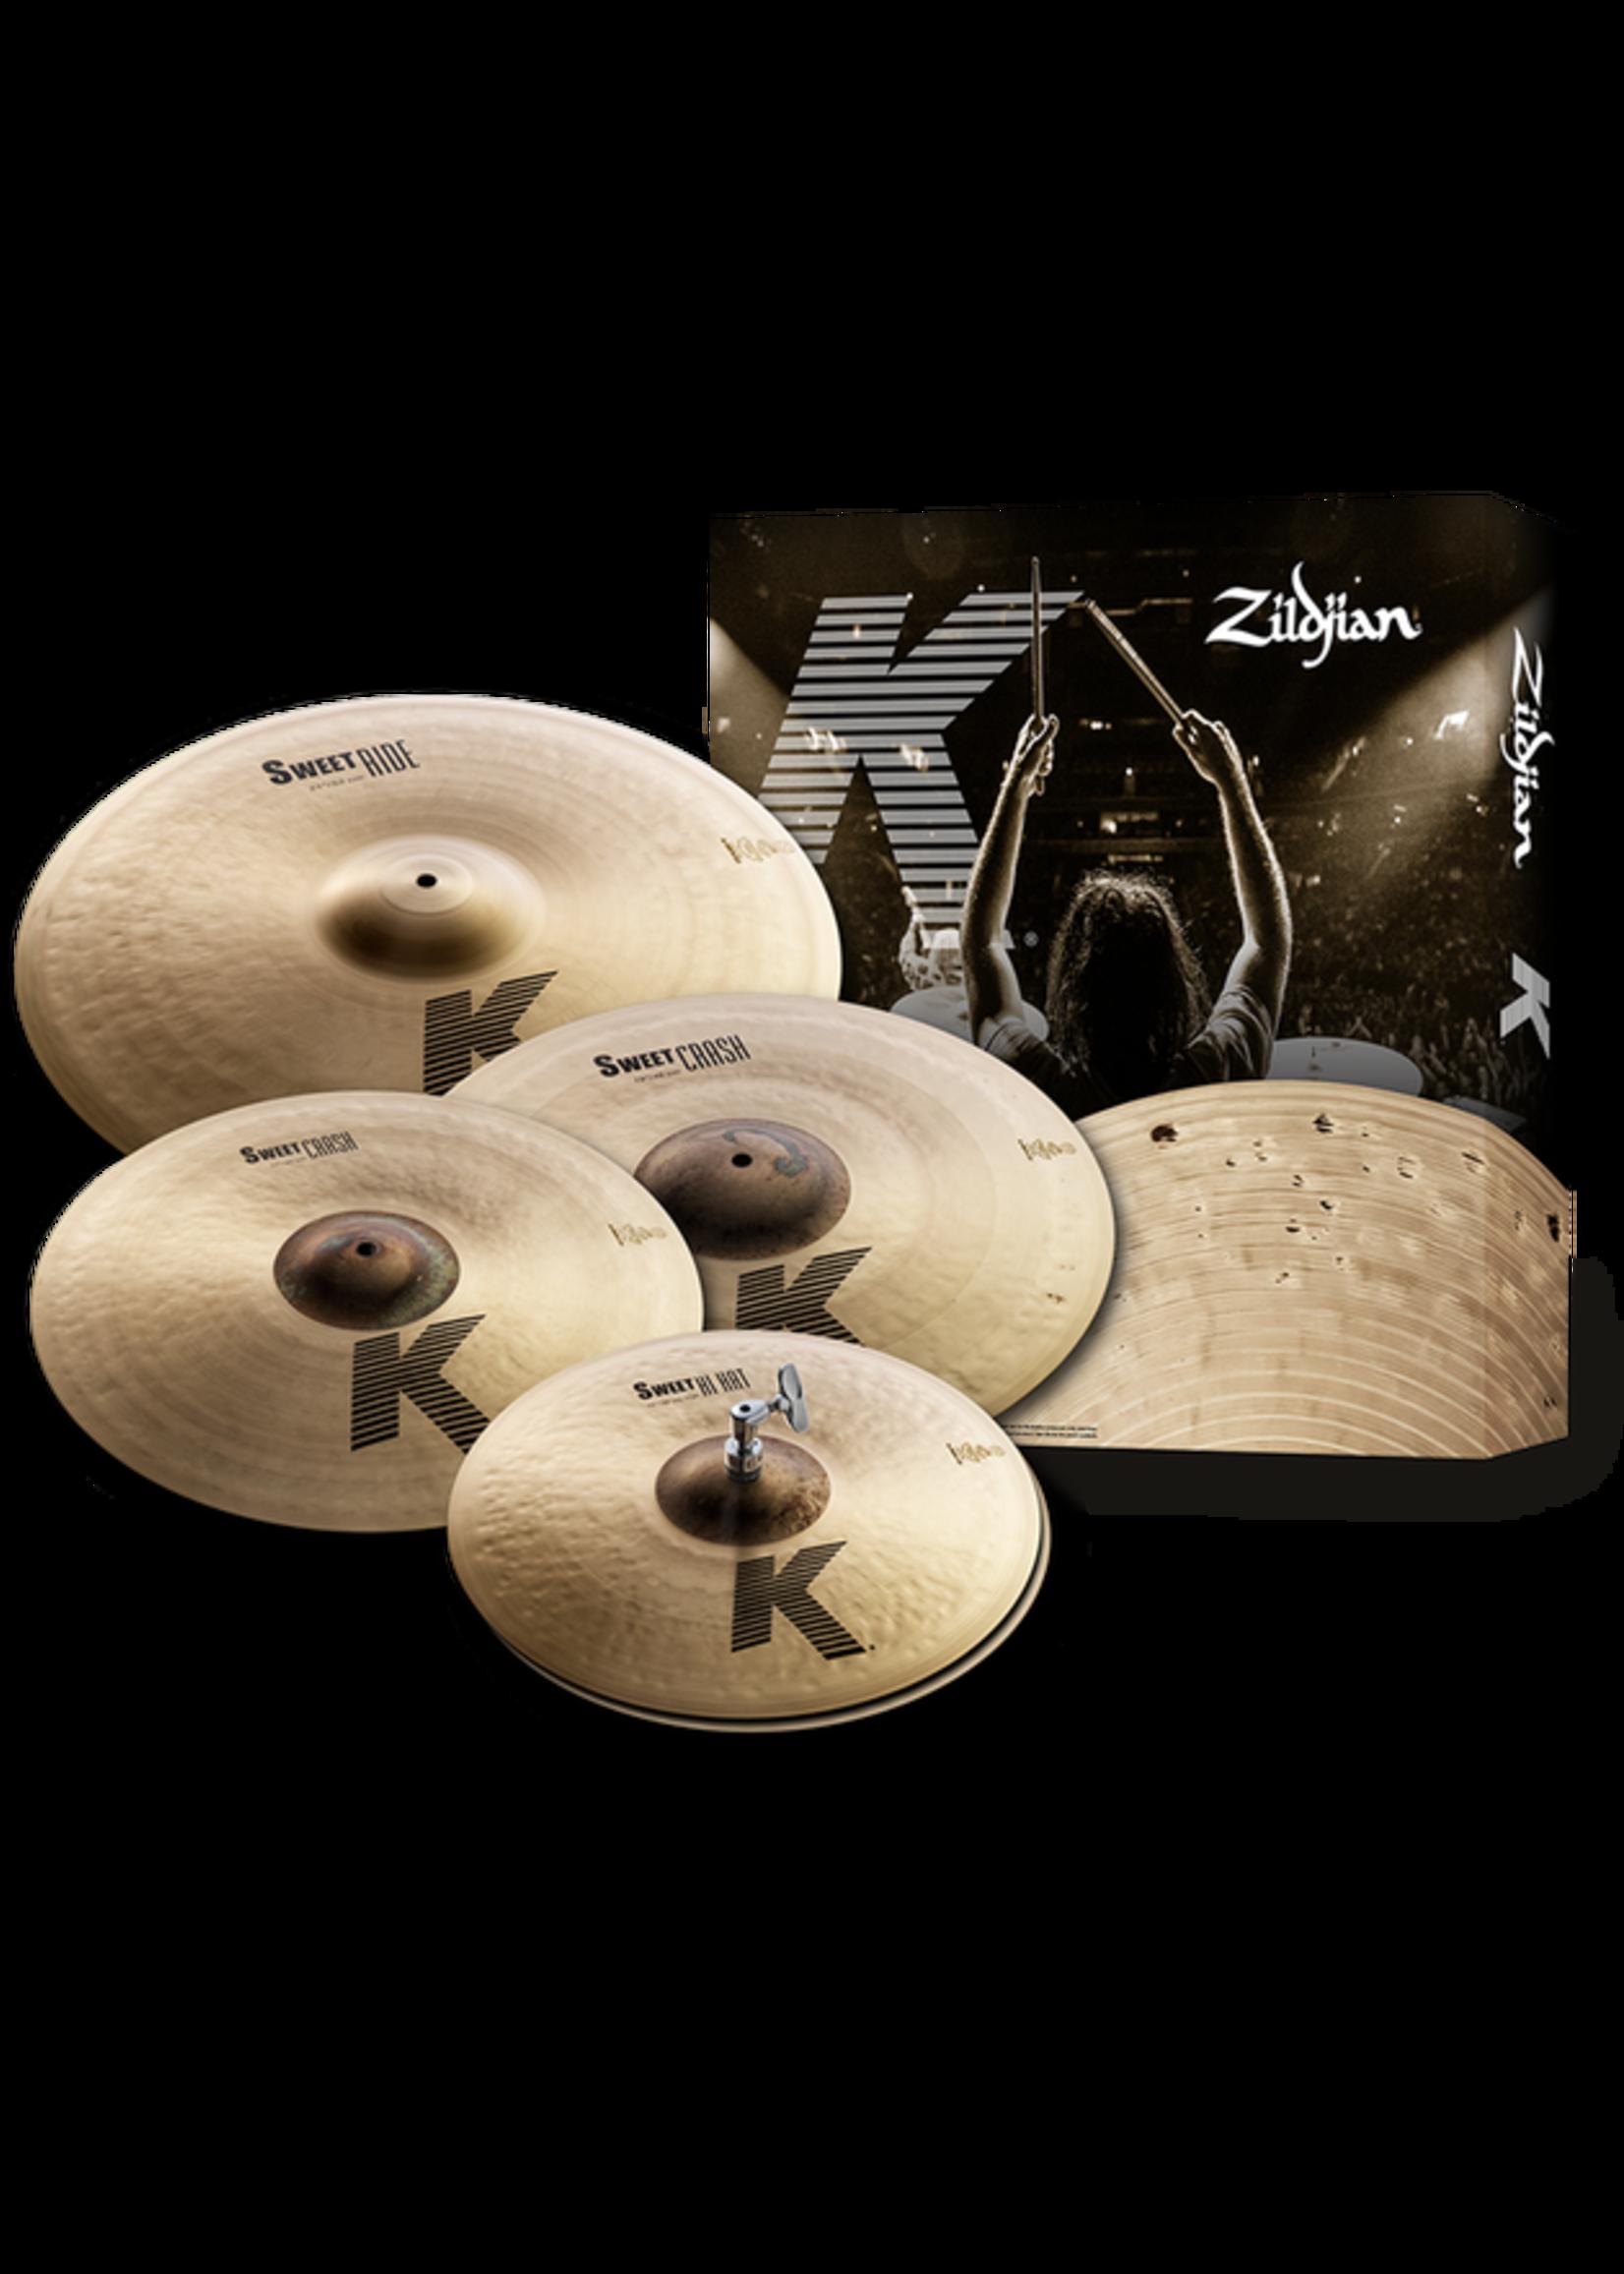 "Zildjian Zildjian K Sweet Box Set 15/17/19/21"" Cymbal Pack"